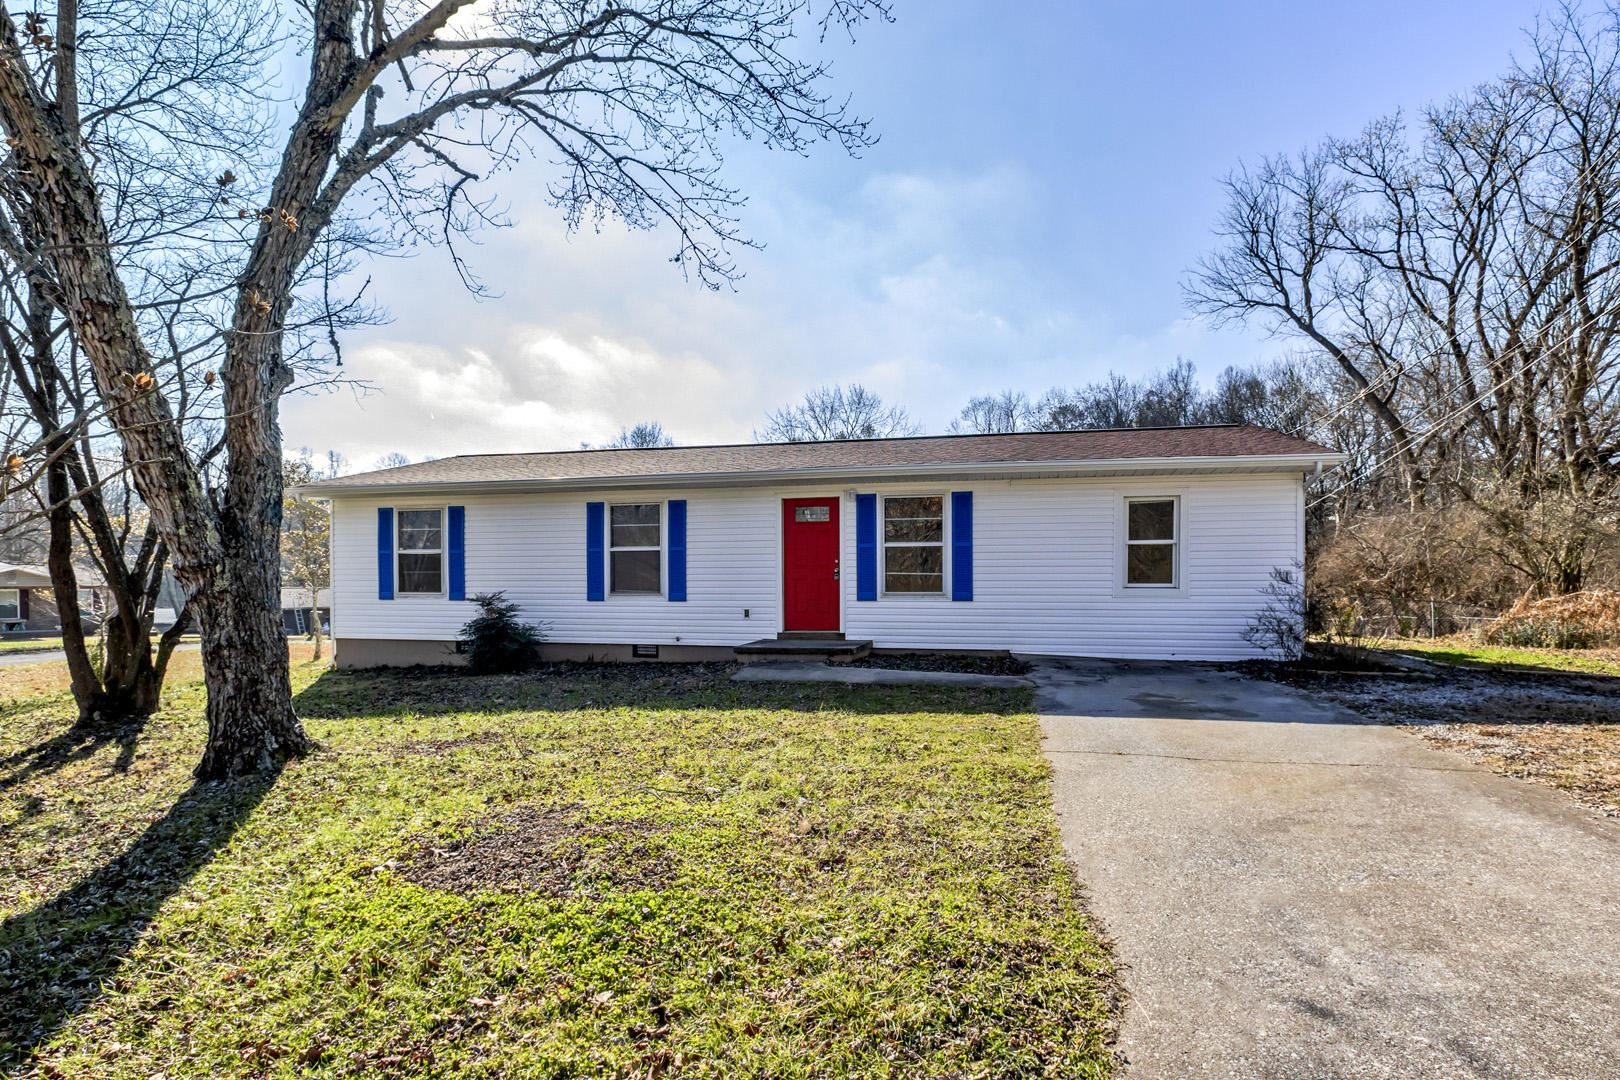 Photo of 2313 Rosann Lane, Knoxville, TN 37918 (MLS # 1140143)